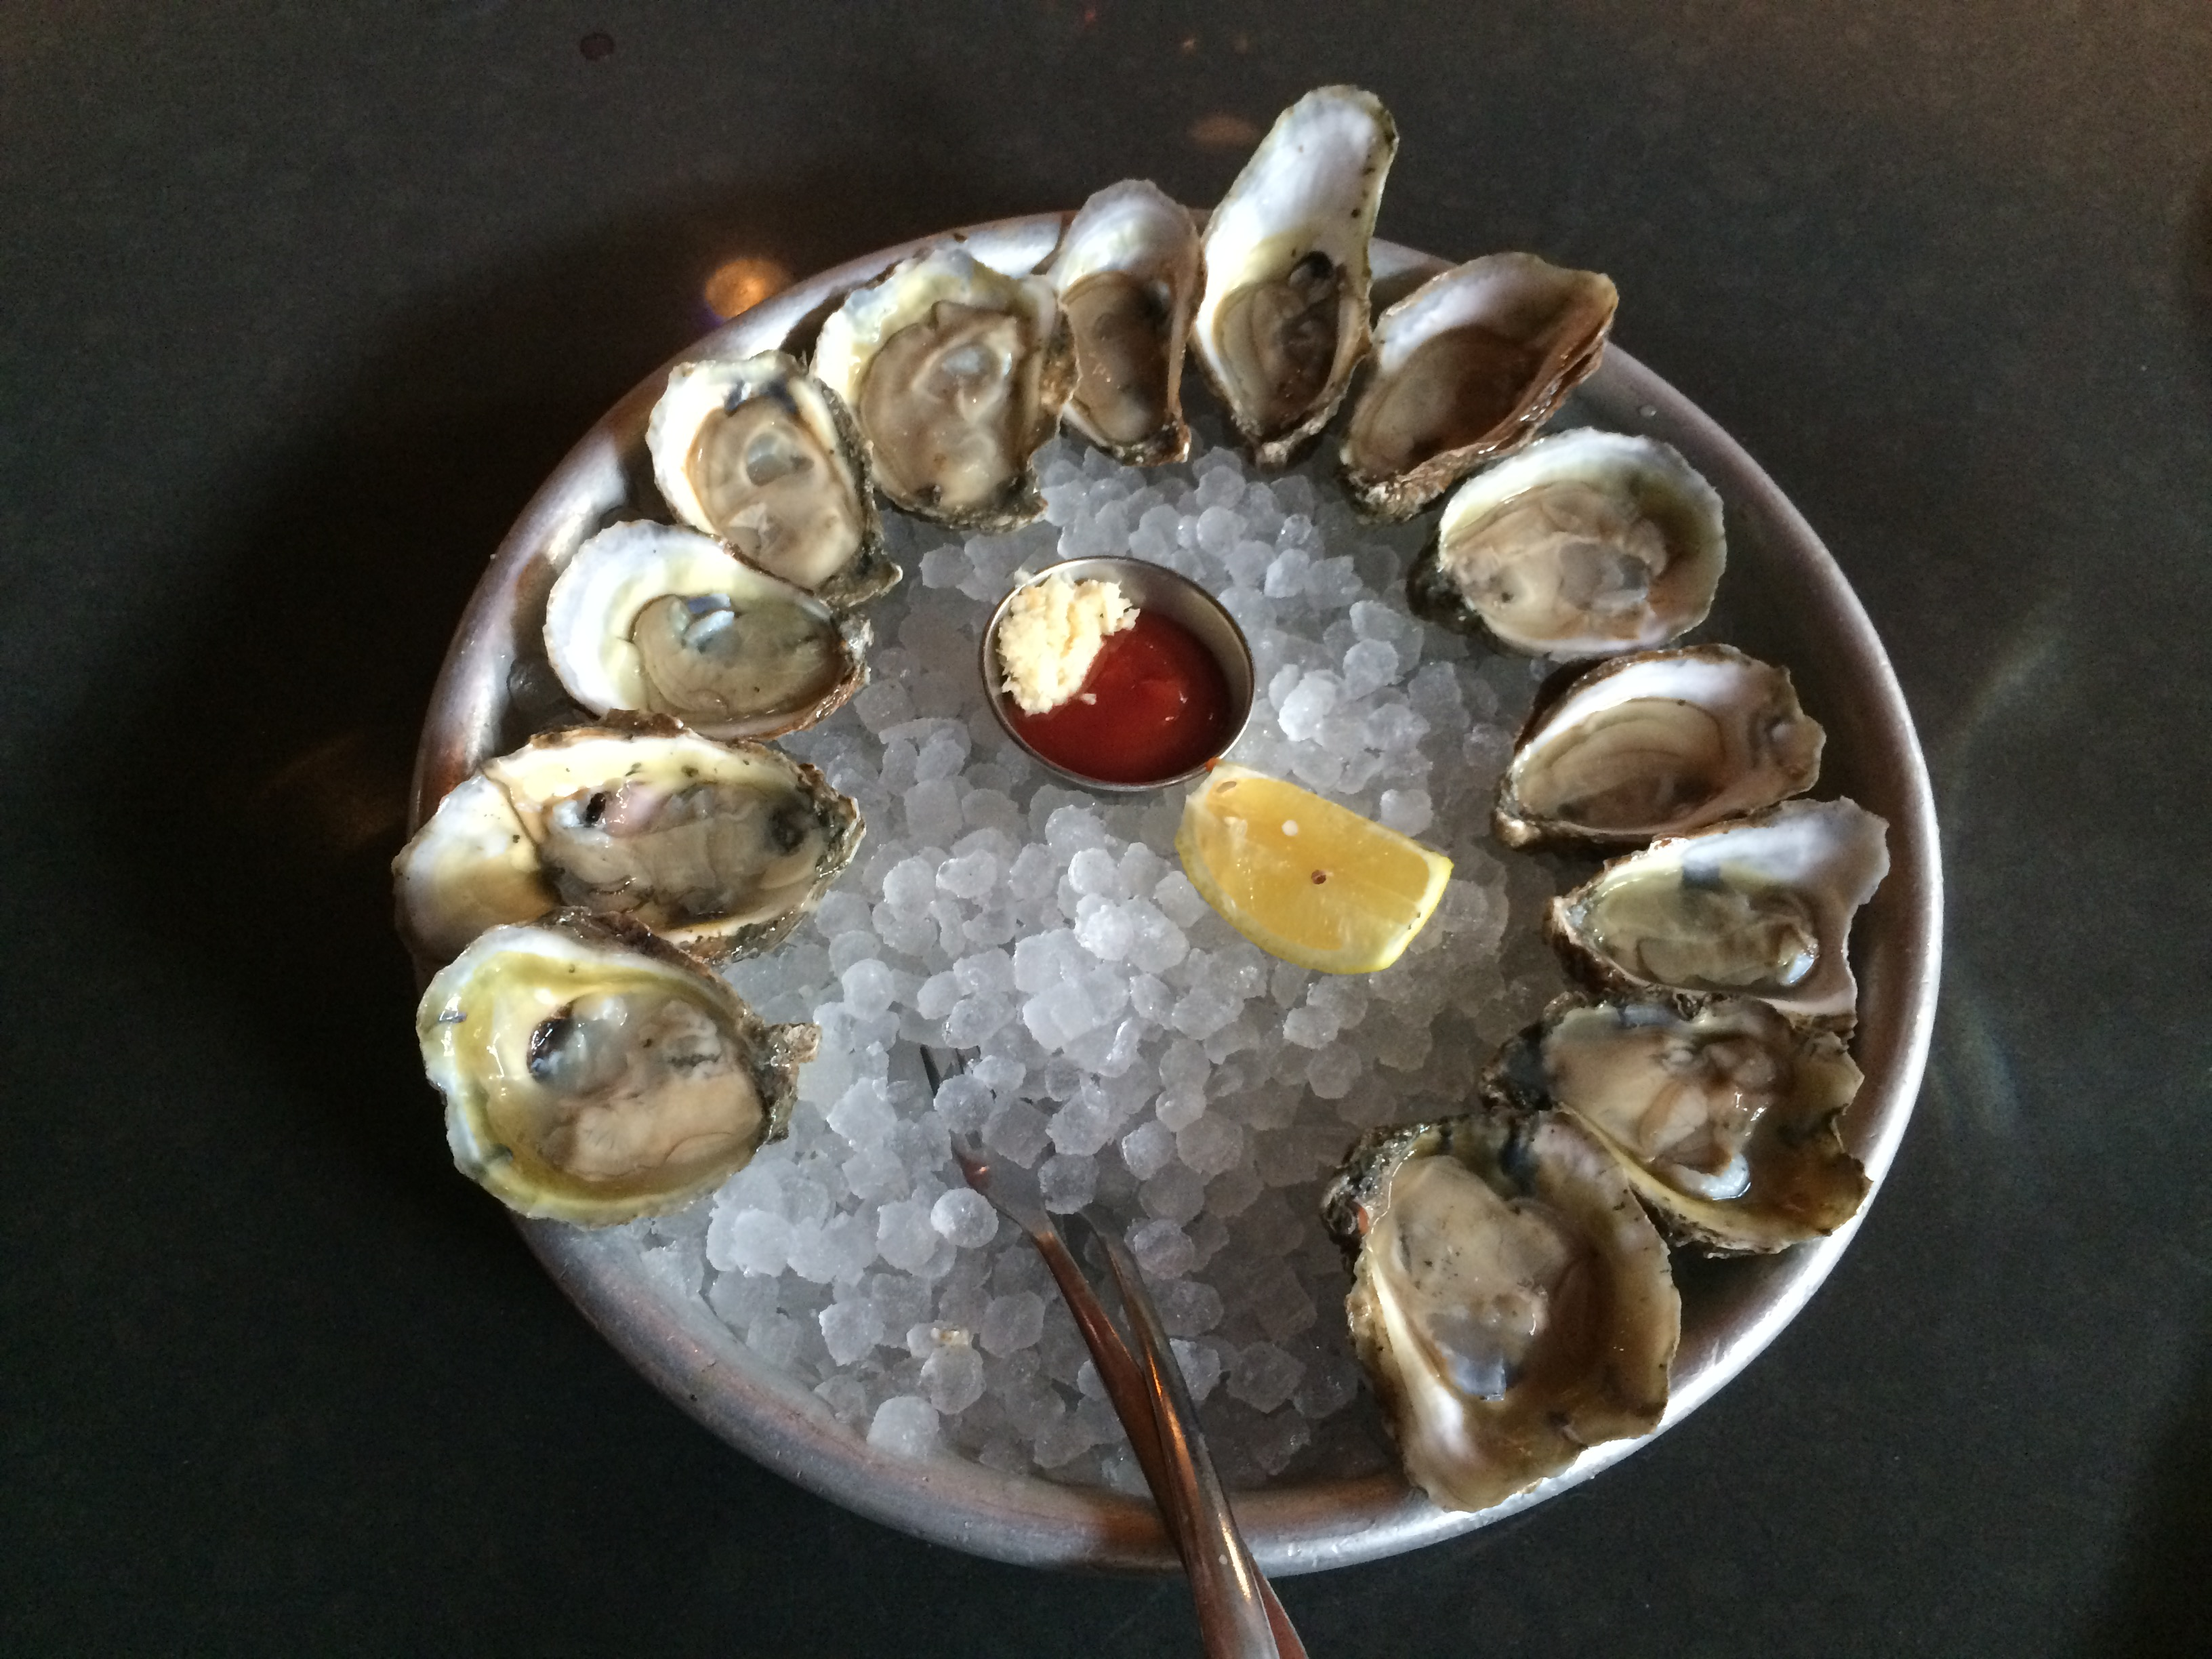 Jax Fish House and Oyster Bar